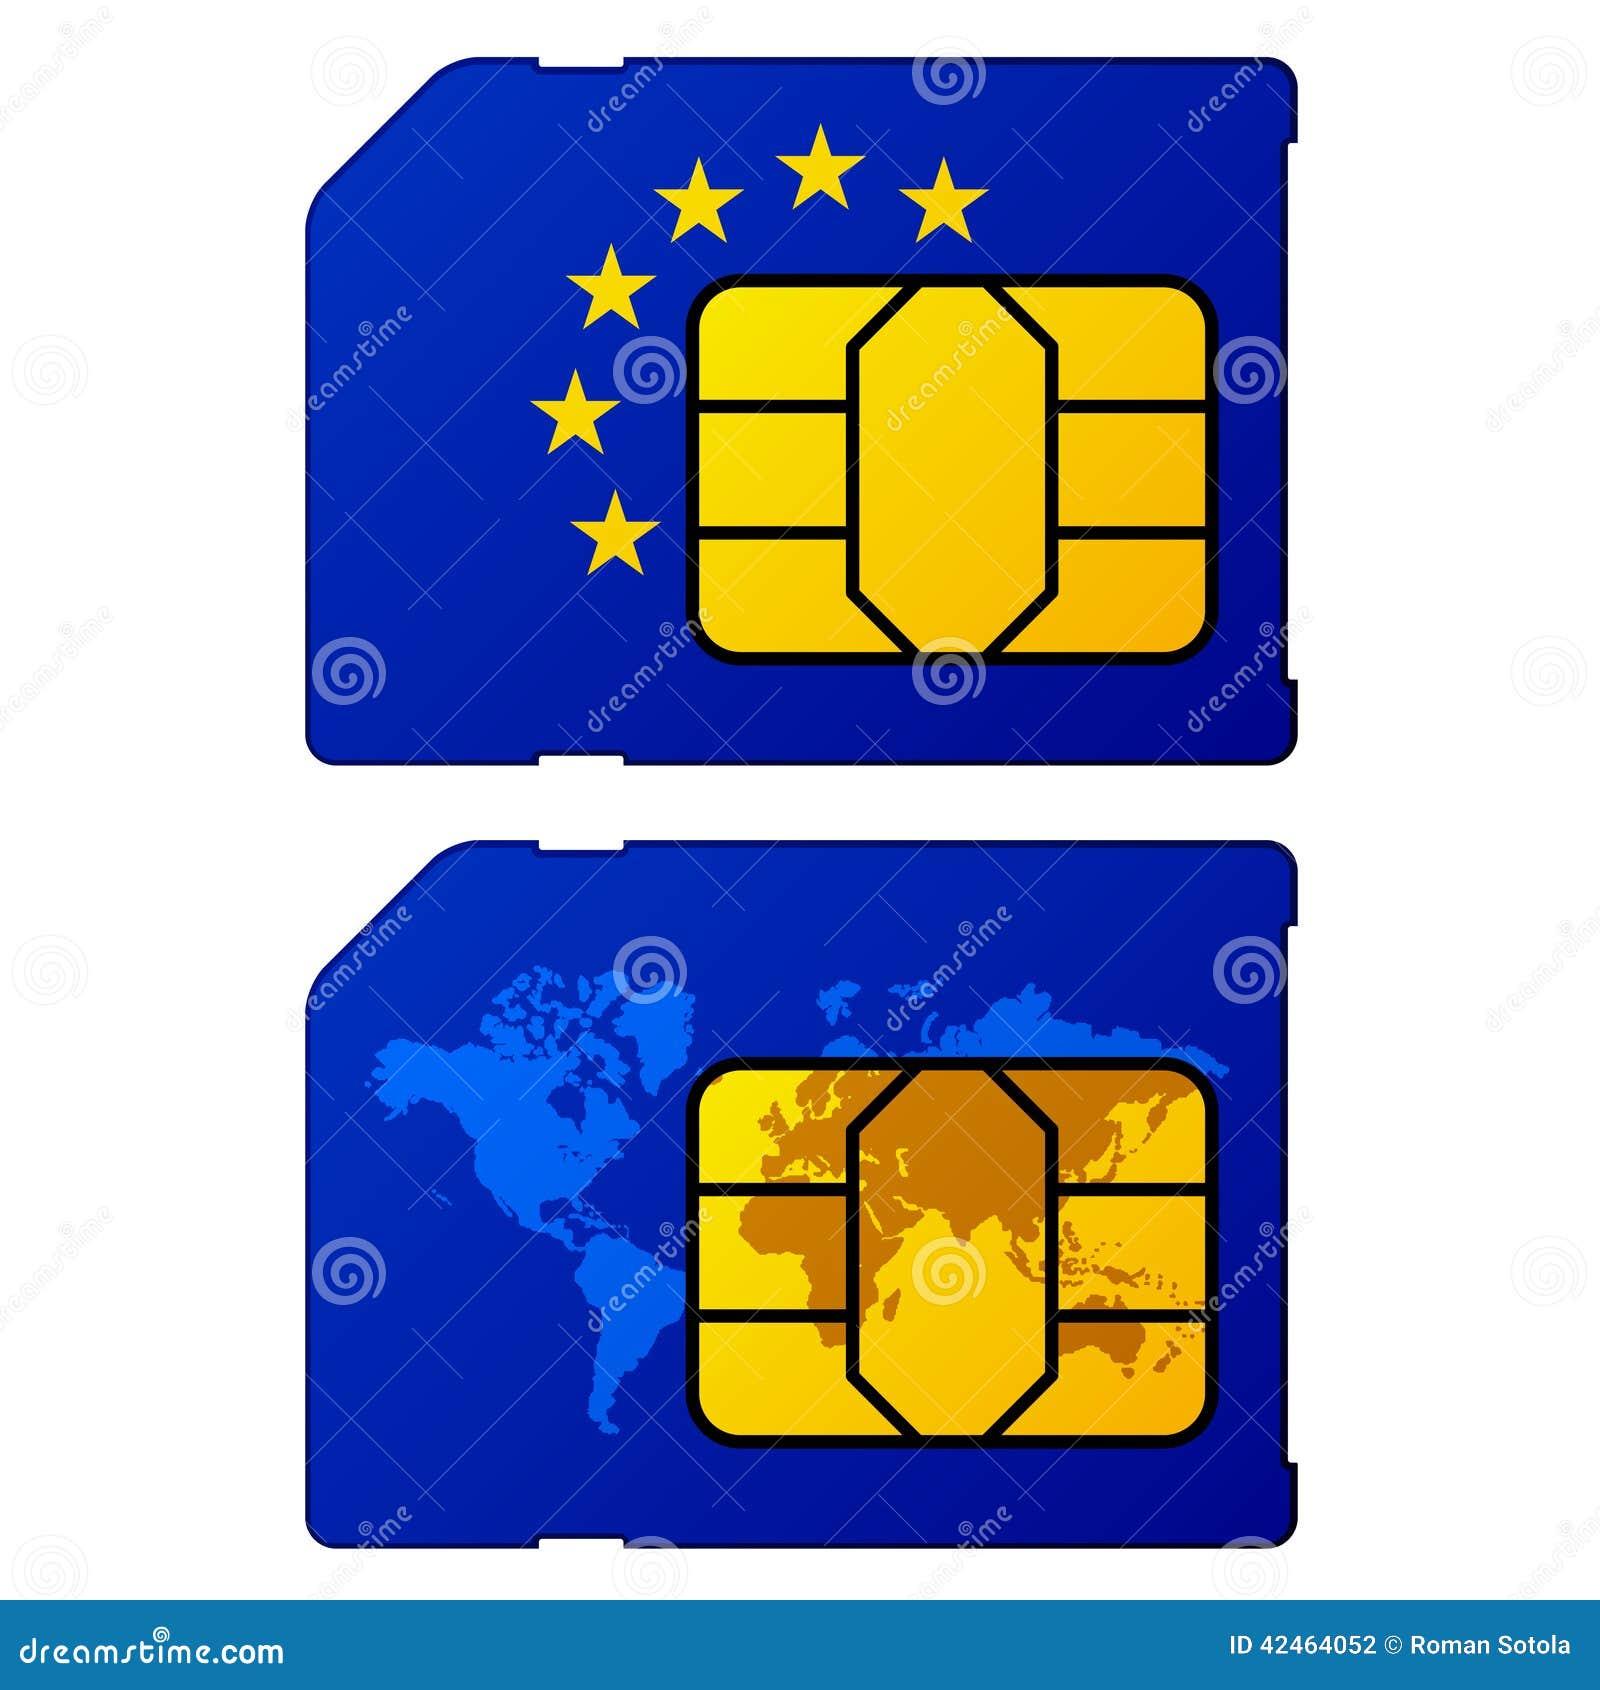 Europa-Flaggenweltkartesim-karte